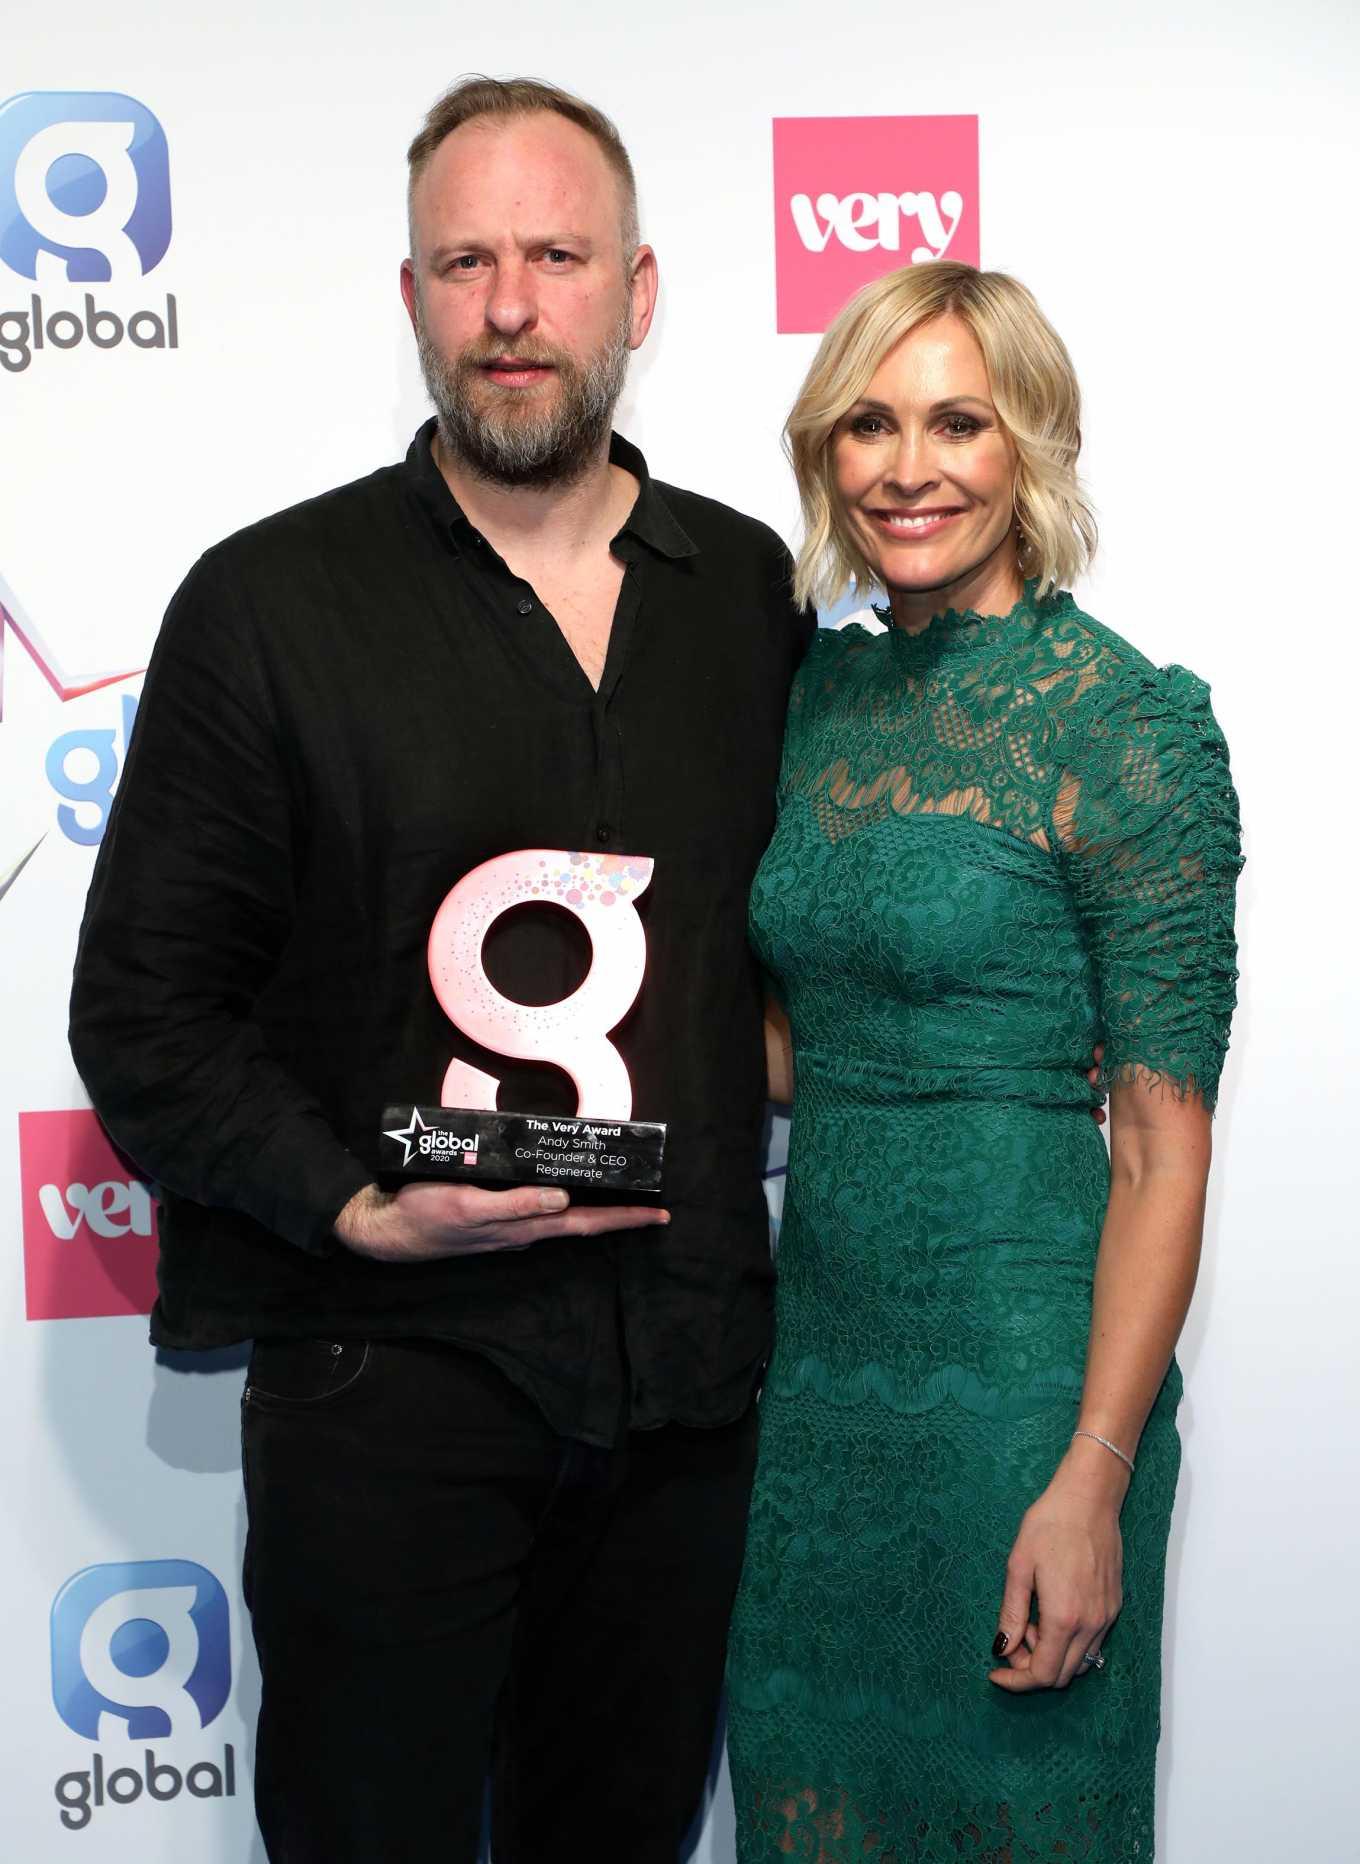 Jenni Falconer 2020 : Jenni Falconer – The Global Awards 2020 in London-02